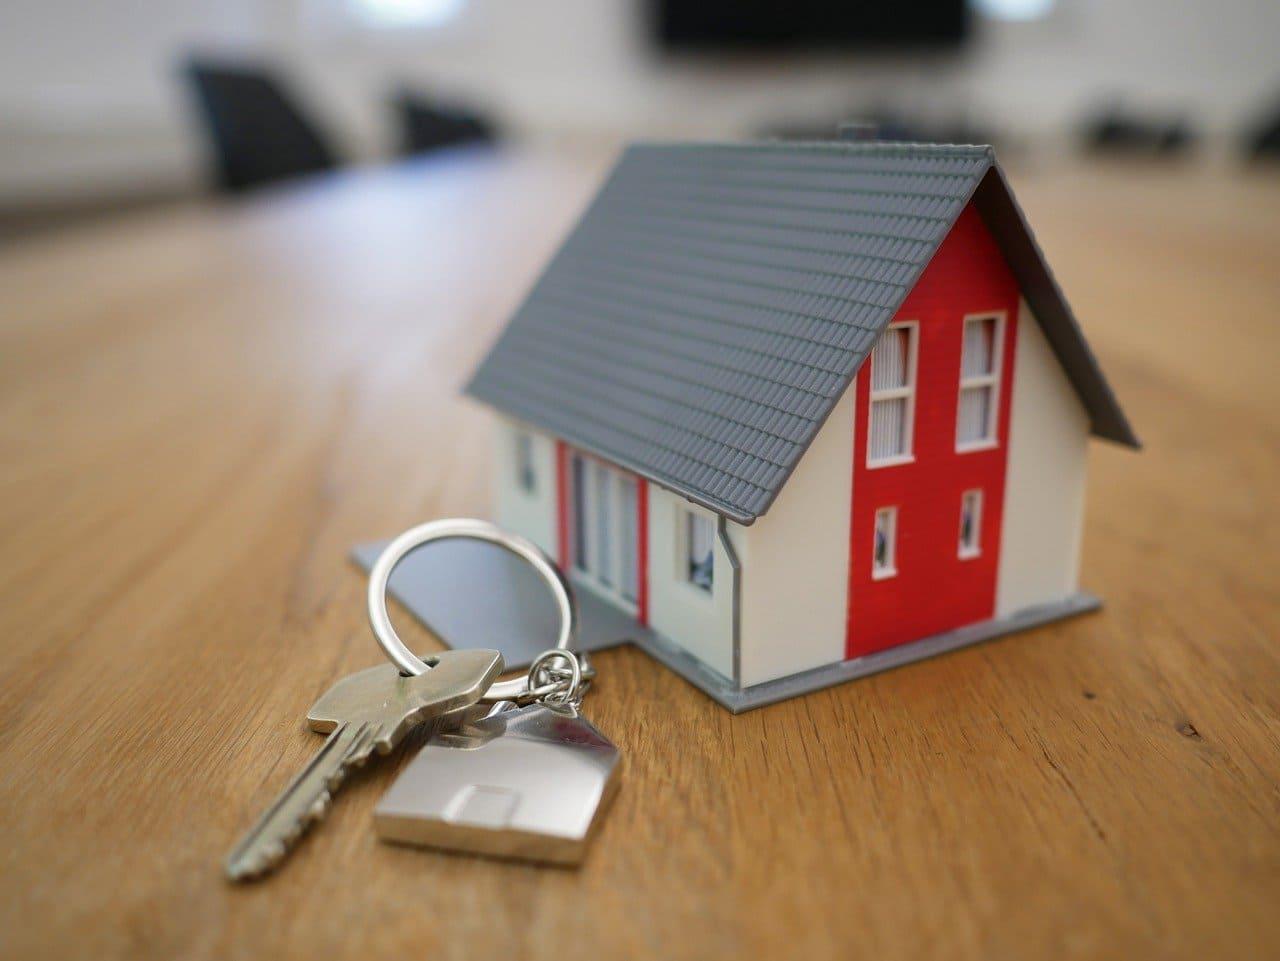 Check estate sales regularly